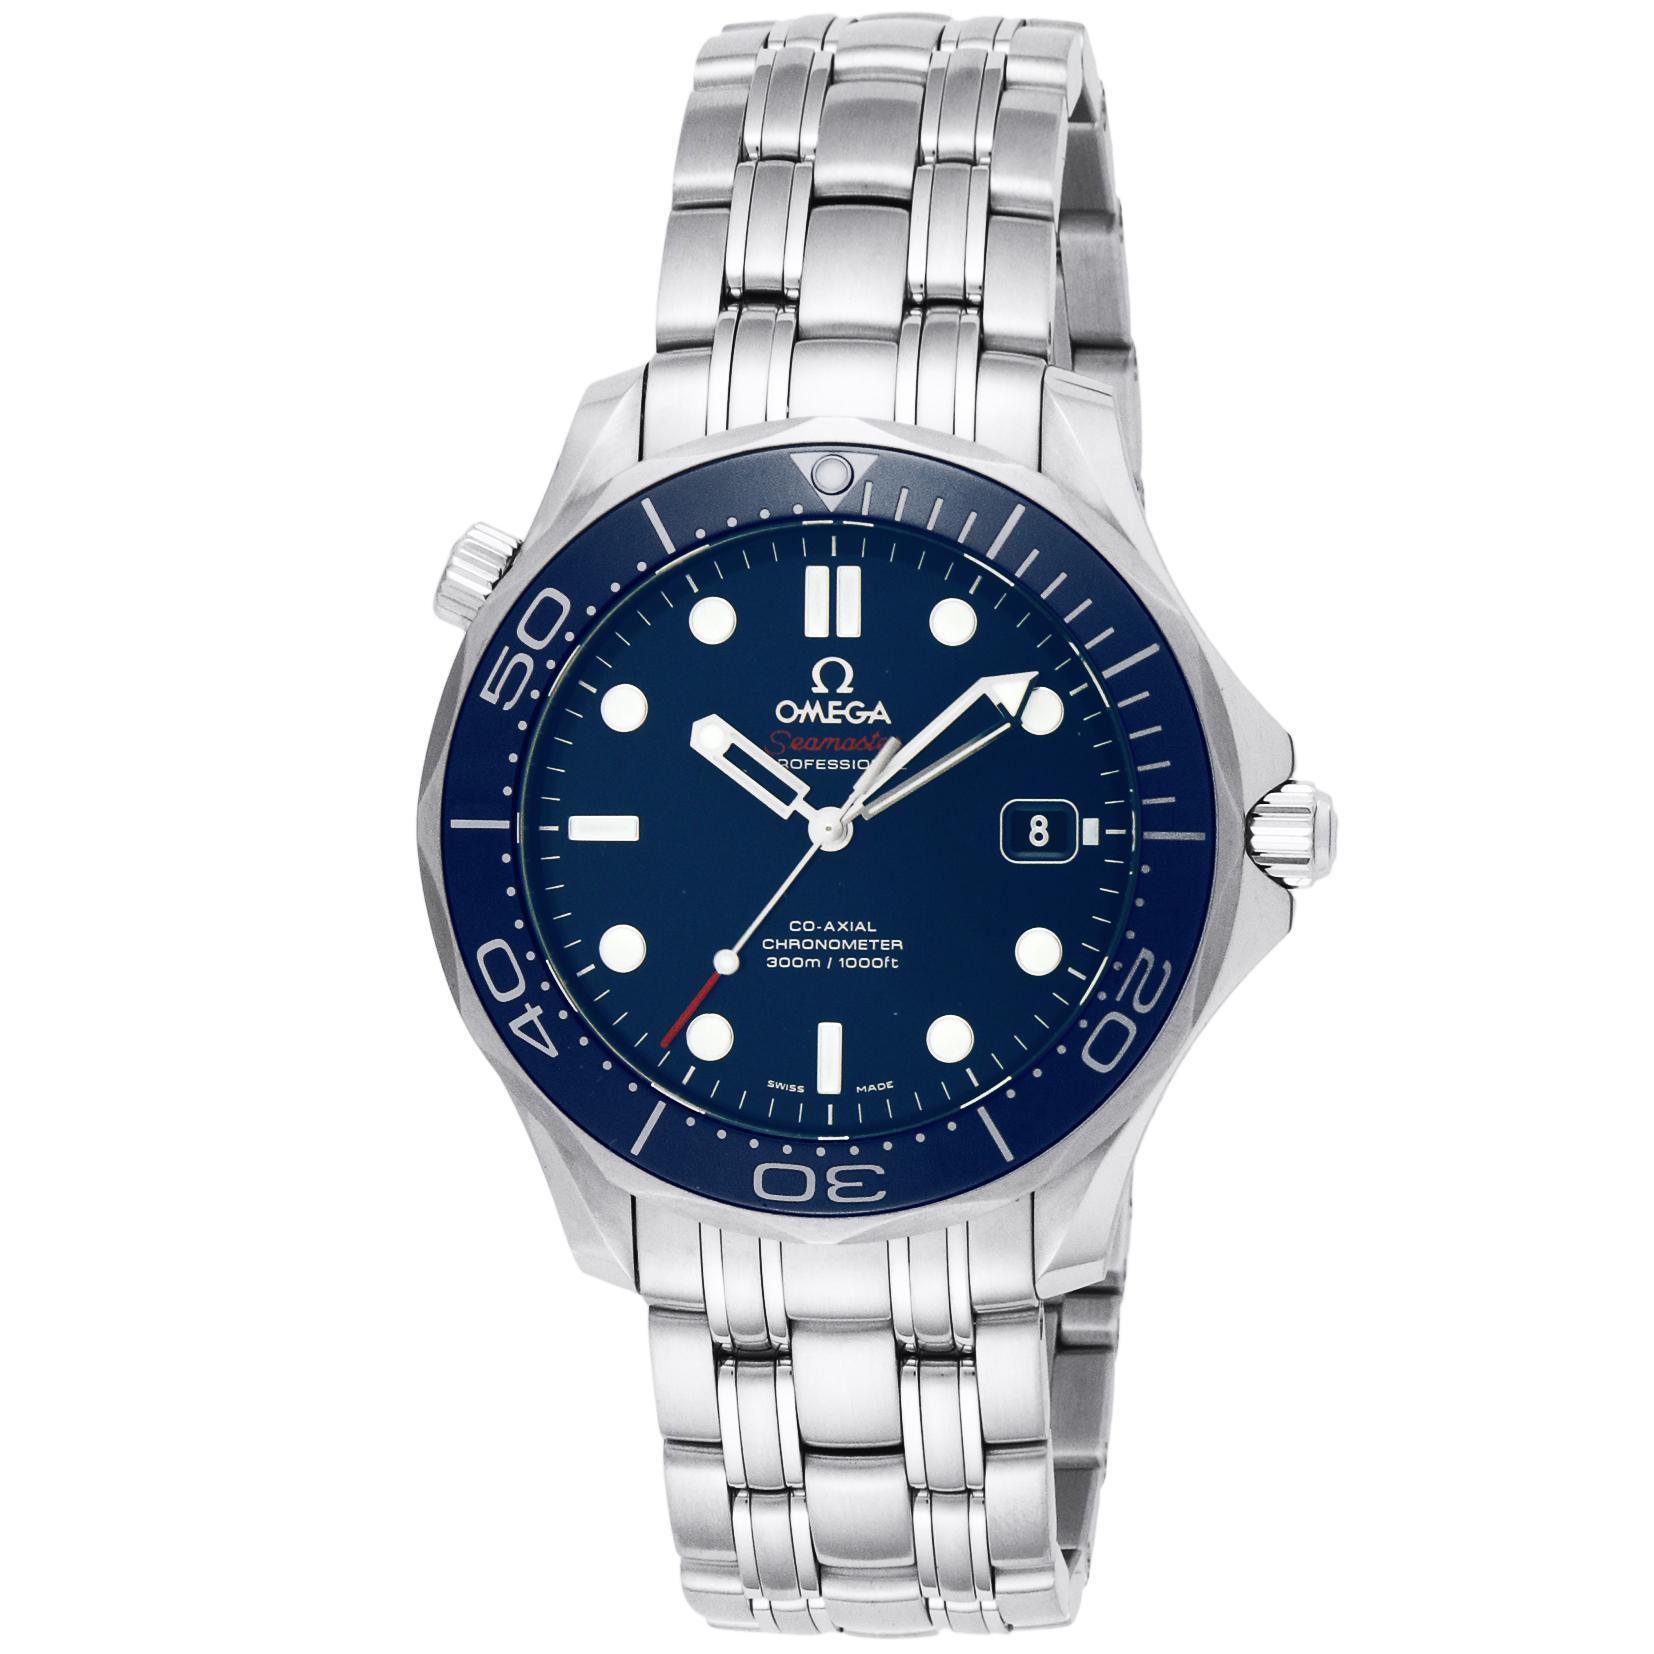 new style b63b6 56c45 [オメガ]OMEGA 腕時計 シーマスター ブルー文字盤 コーアクシャル自動巻 300M防水 クロノメーター 212.30.41.20.03.001  メンズ 【並行輸入品】